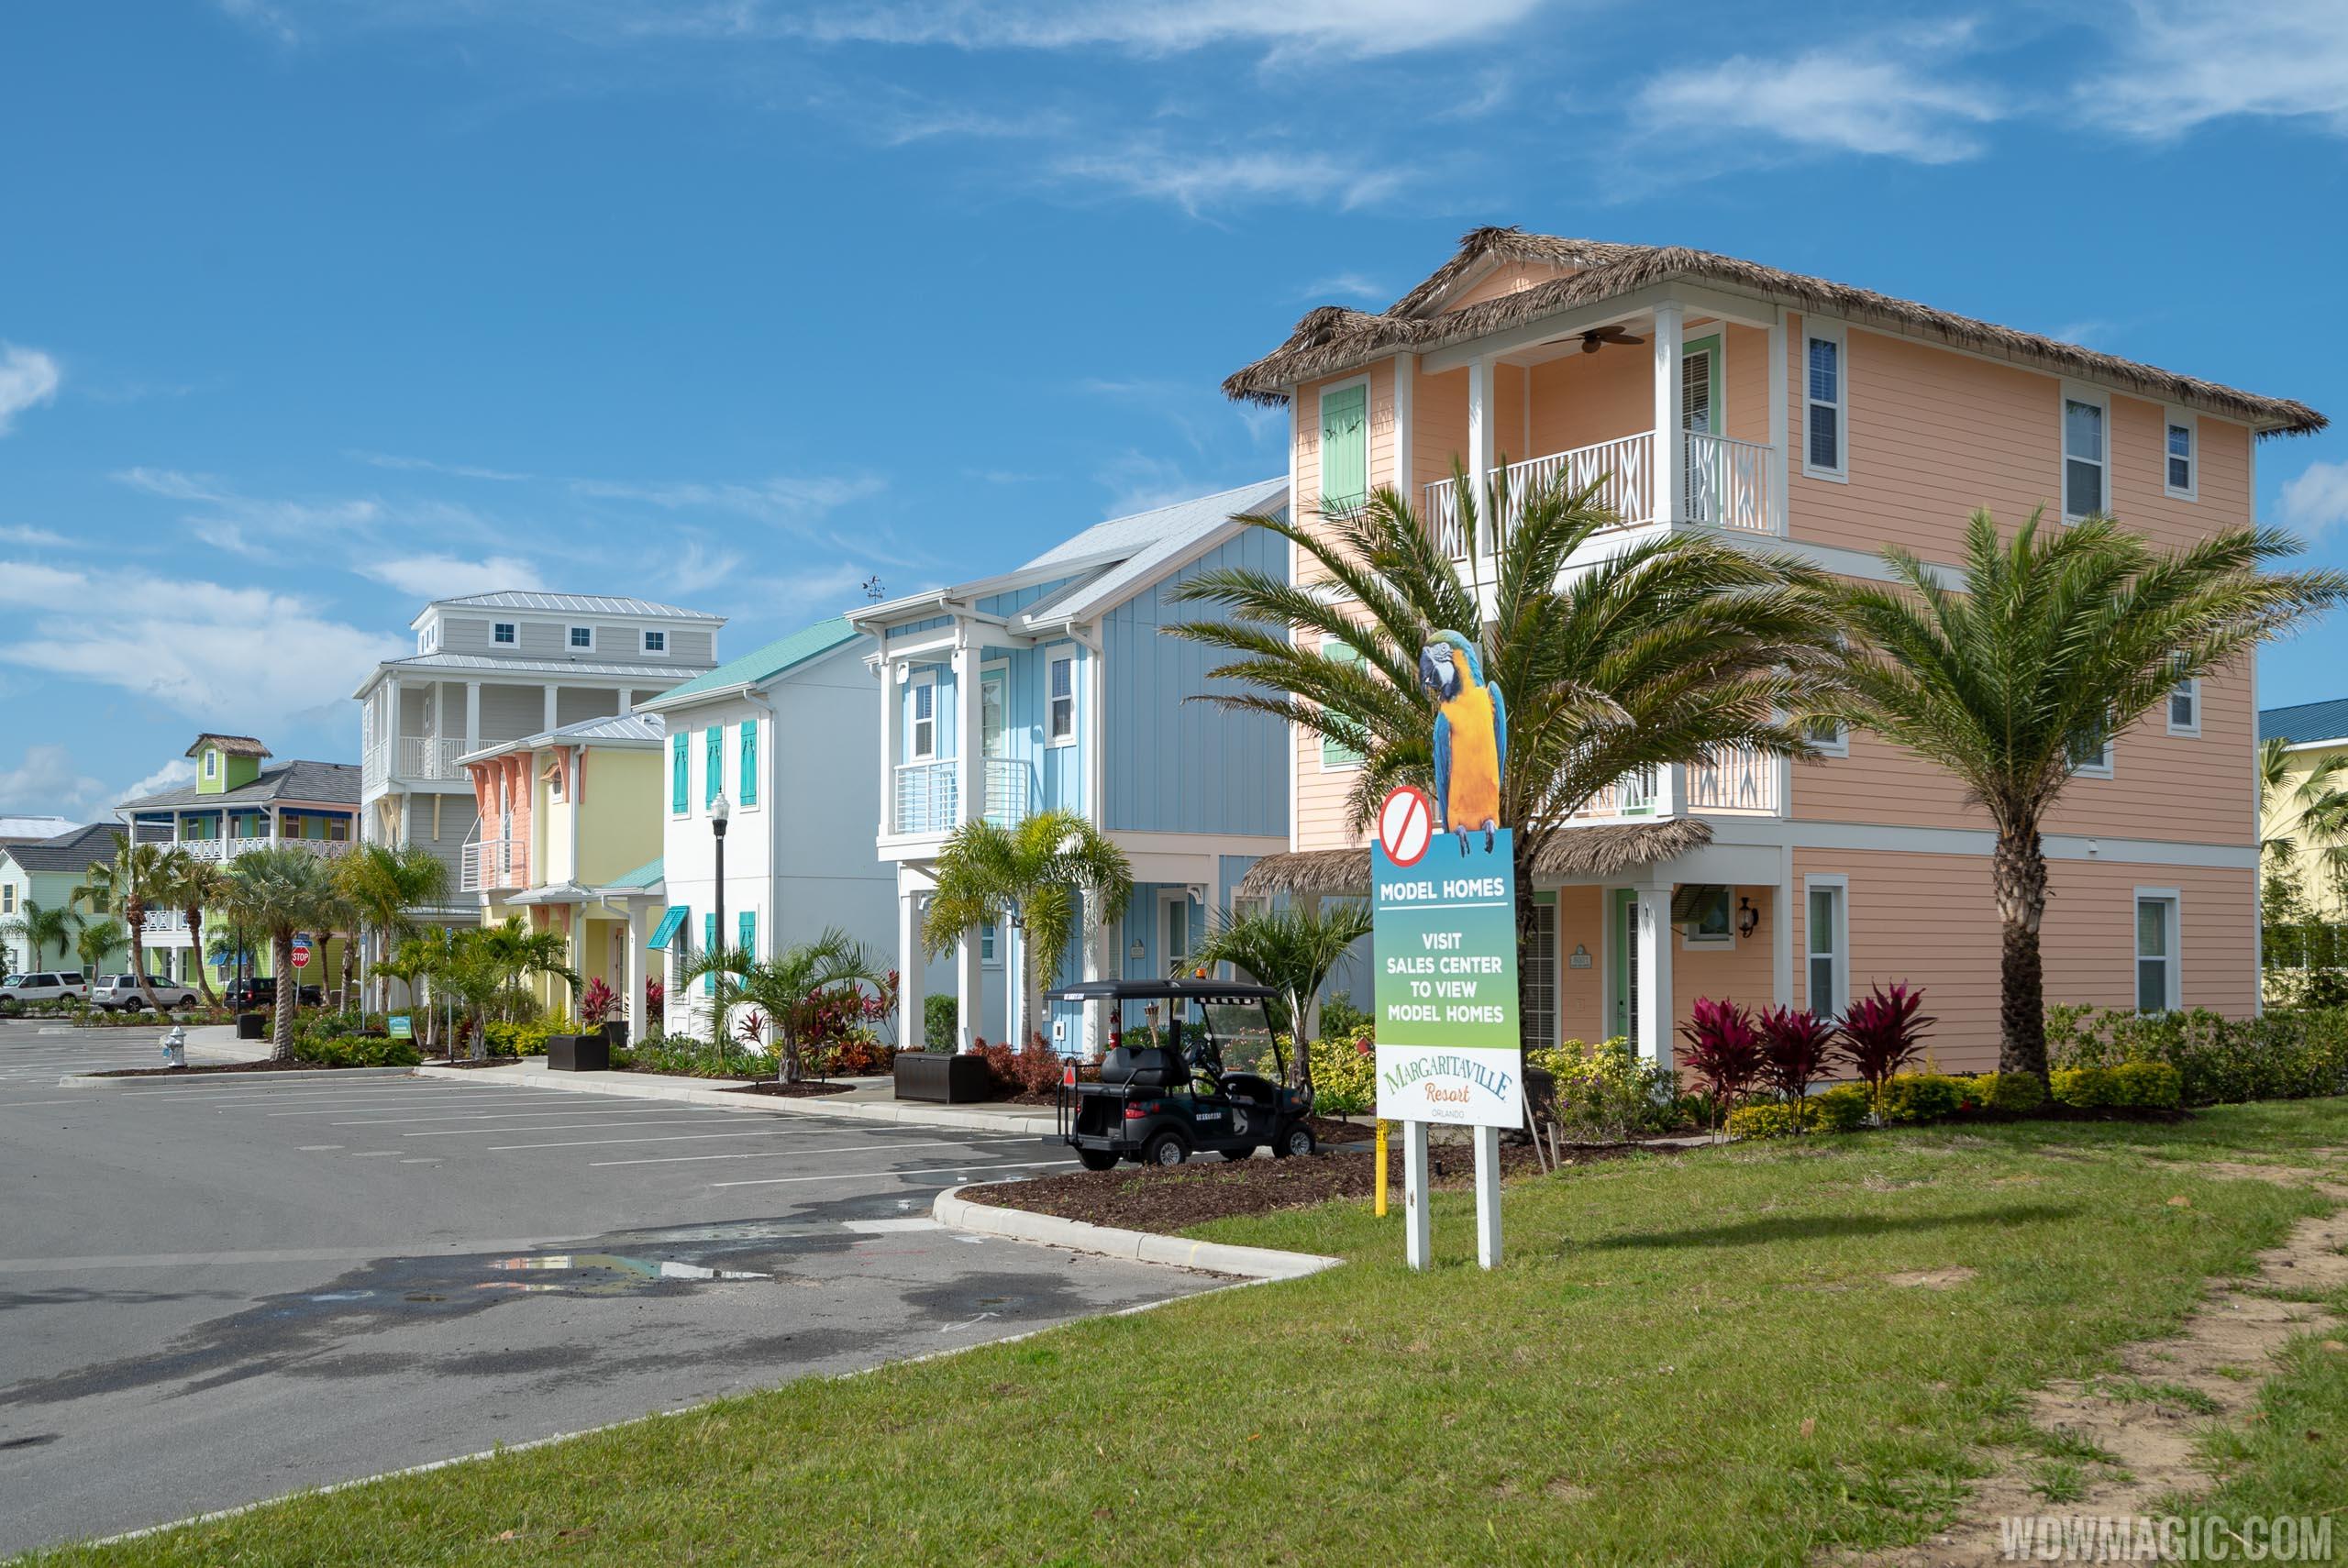 Margaritaville Resort Orlando tour - Photo 39 of 43